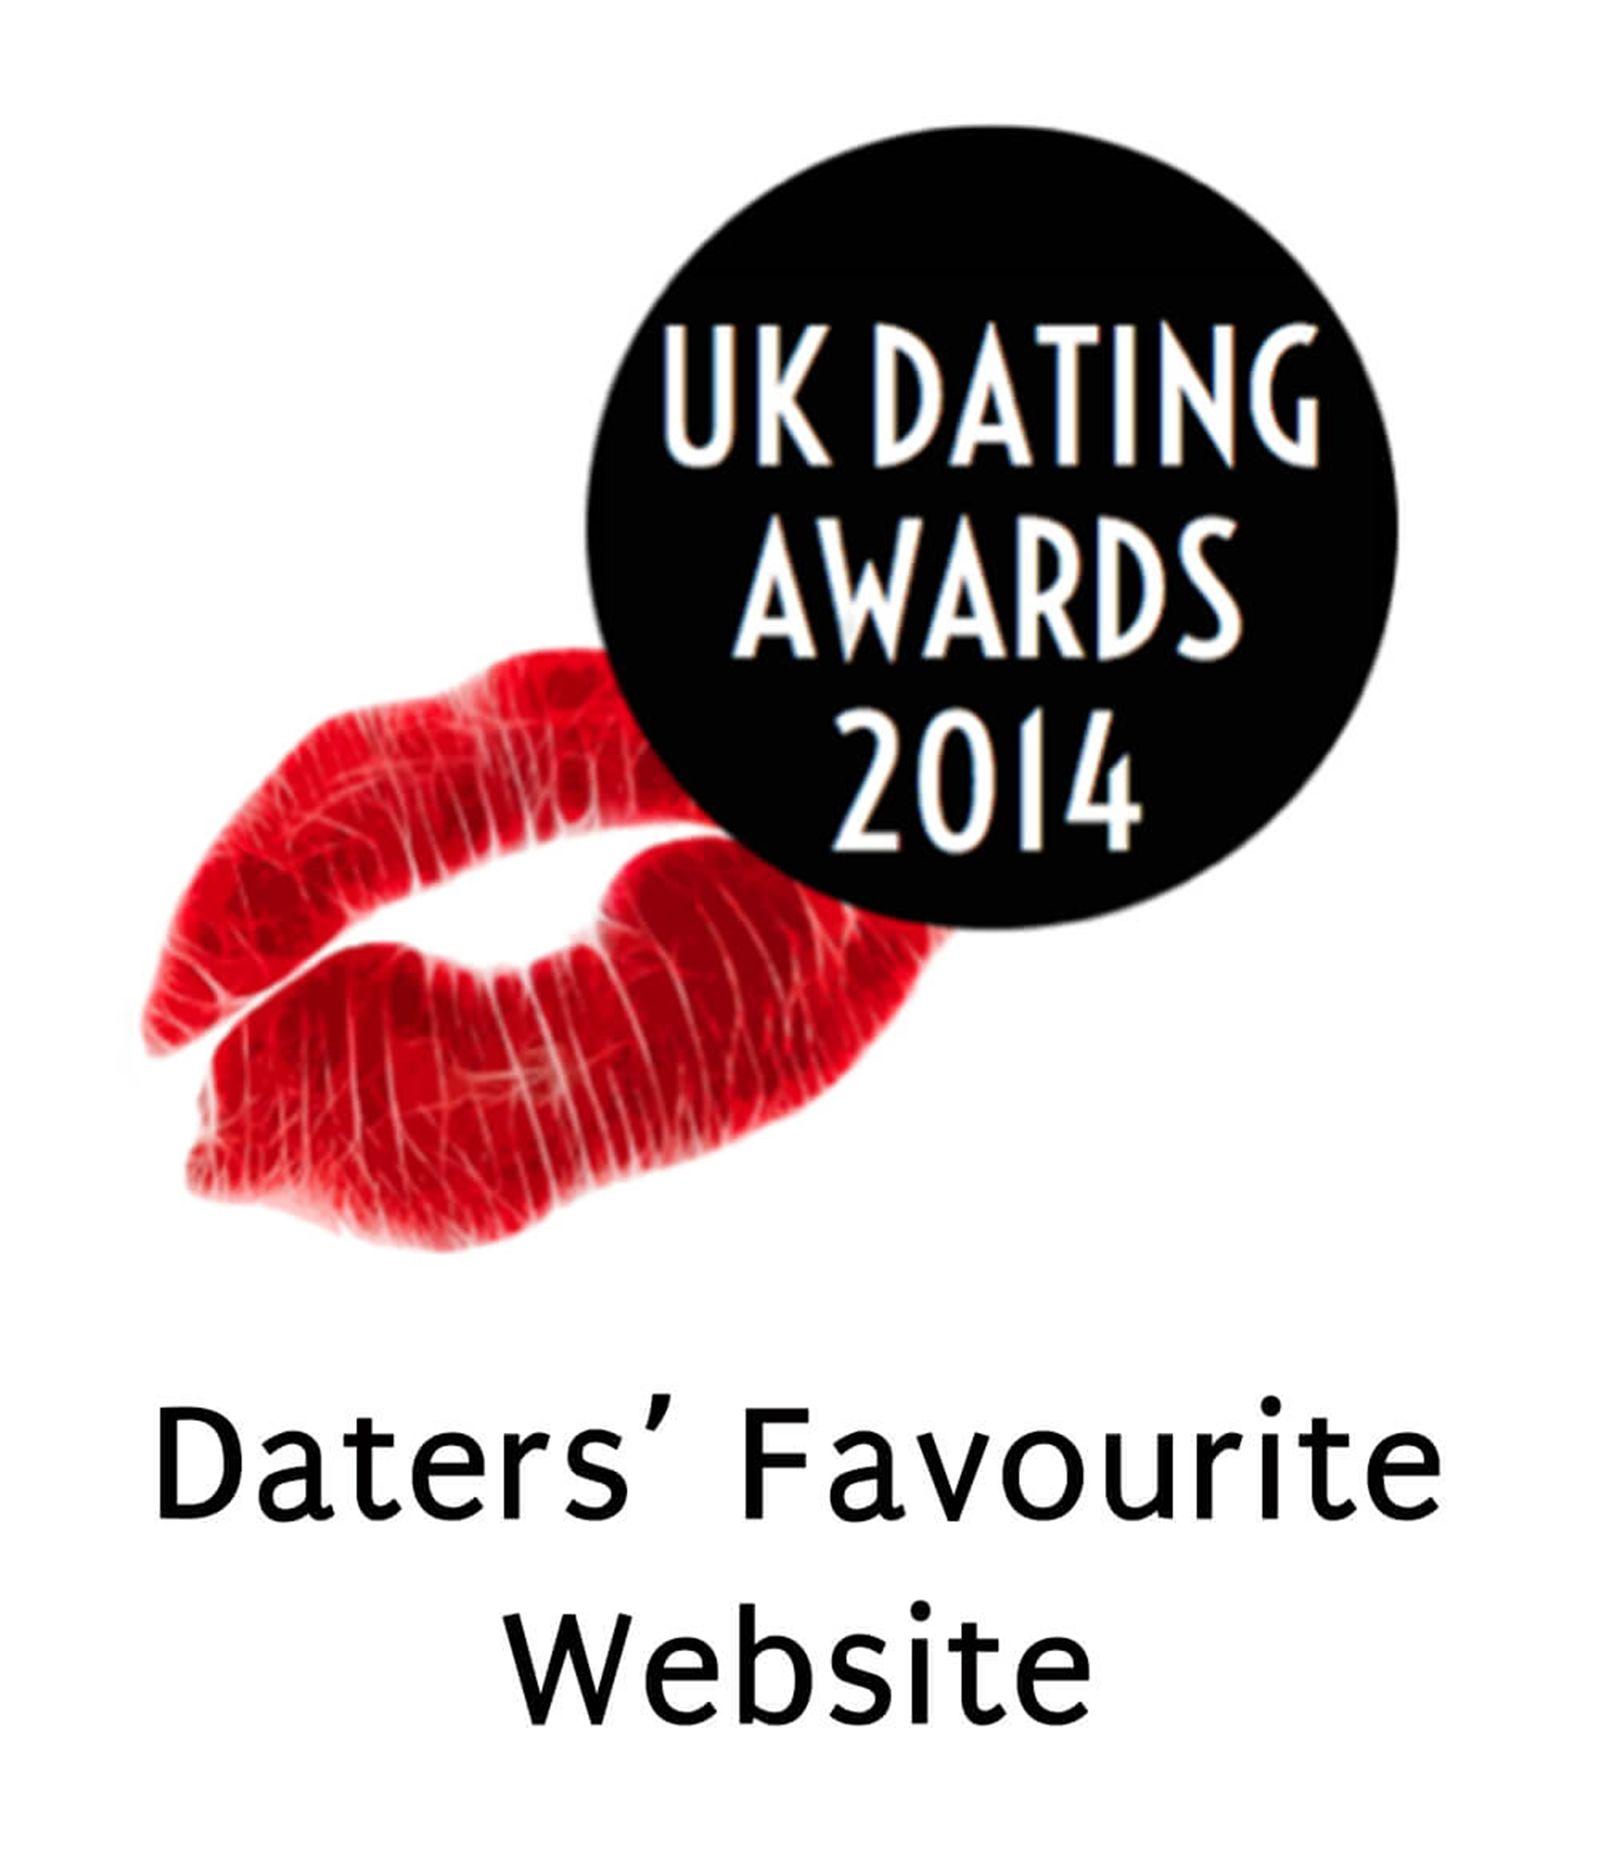 The Guardian Soulmates UK Dating Awards 2014 Daters' Favorite Website